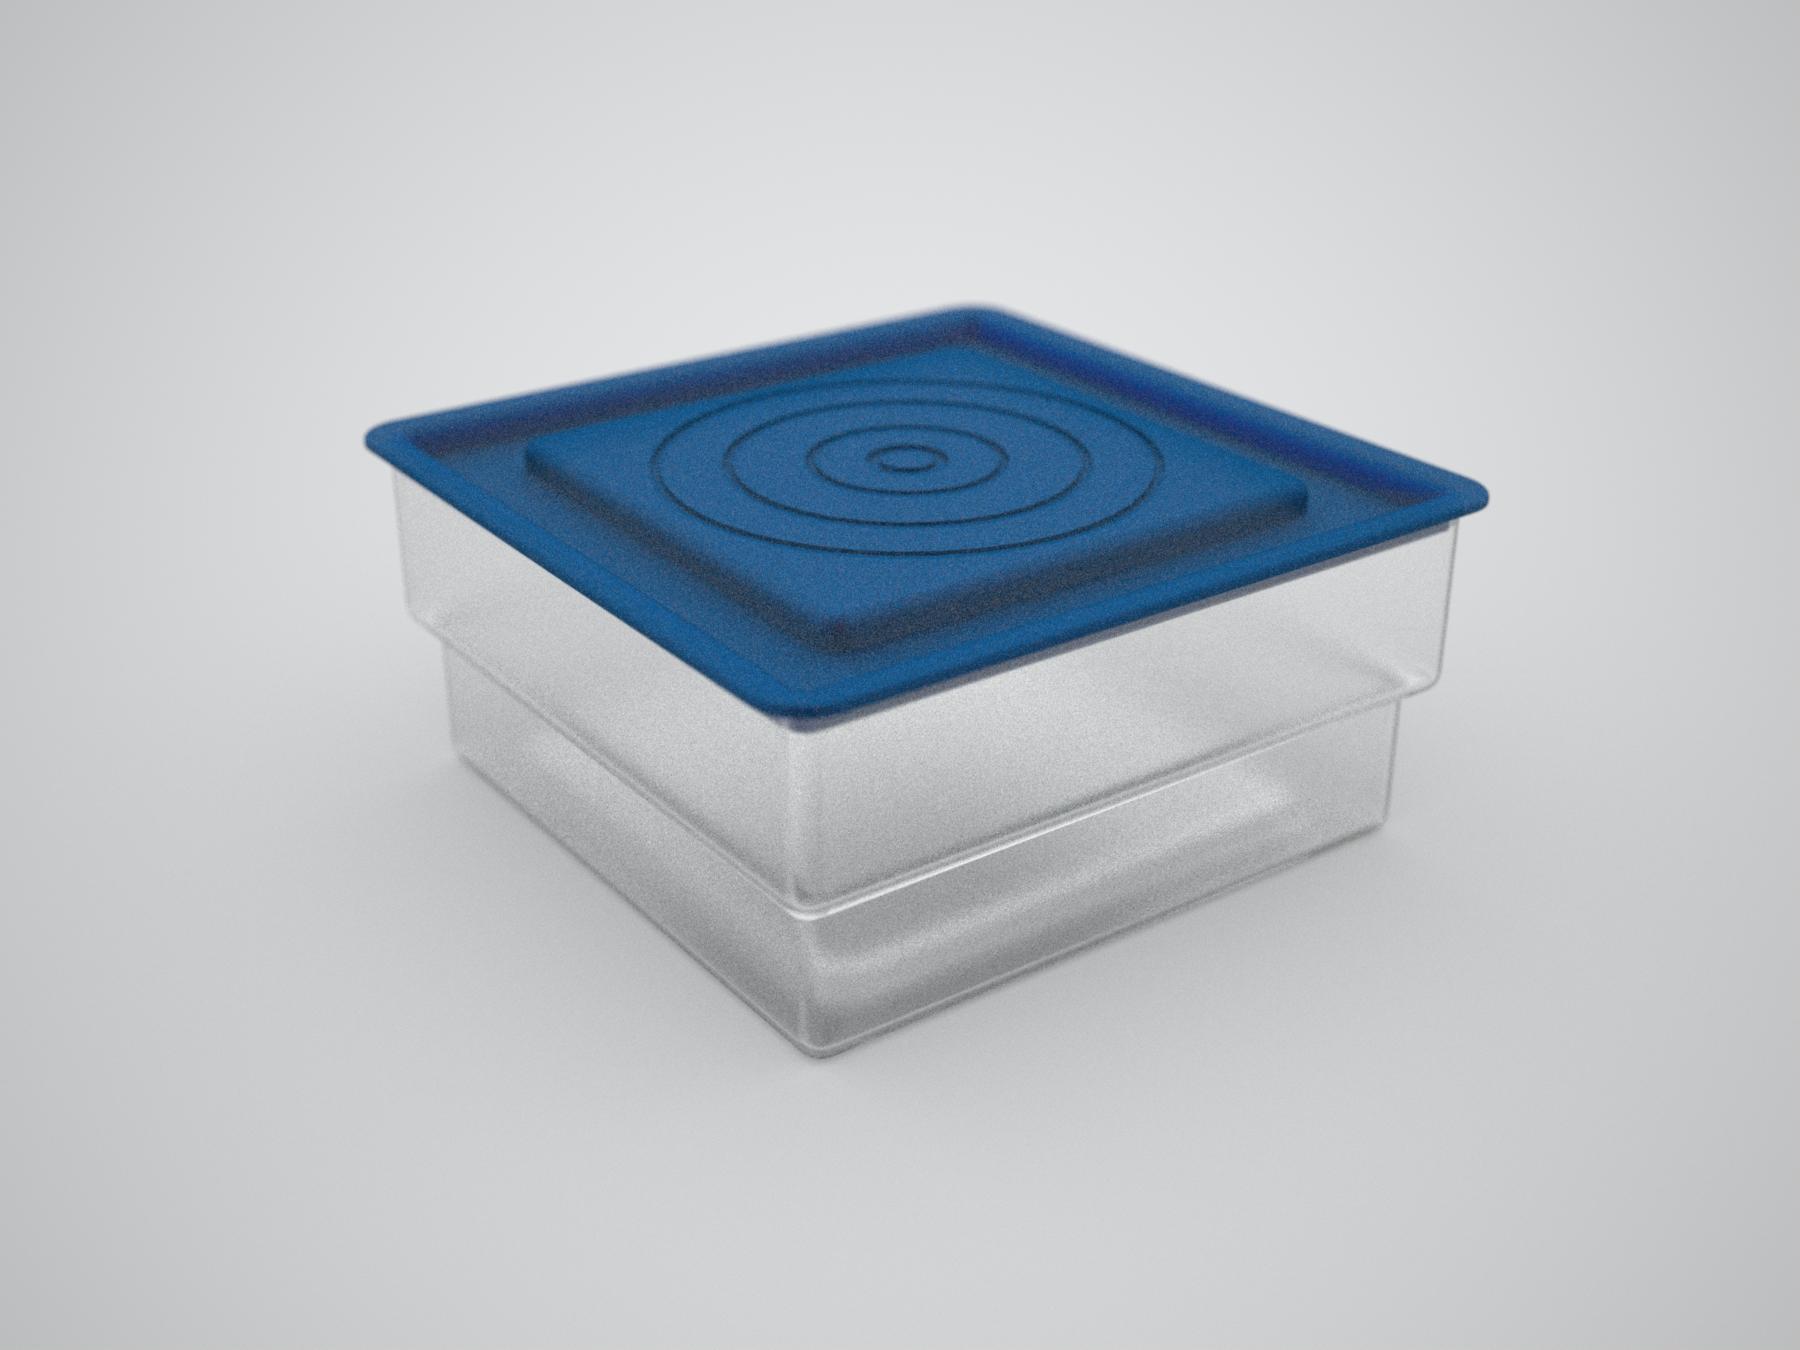 plastic container render 1.jpg